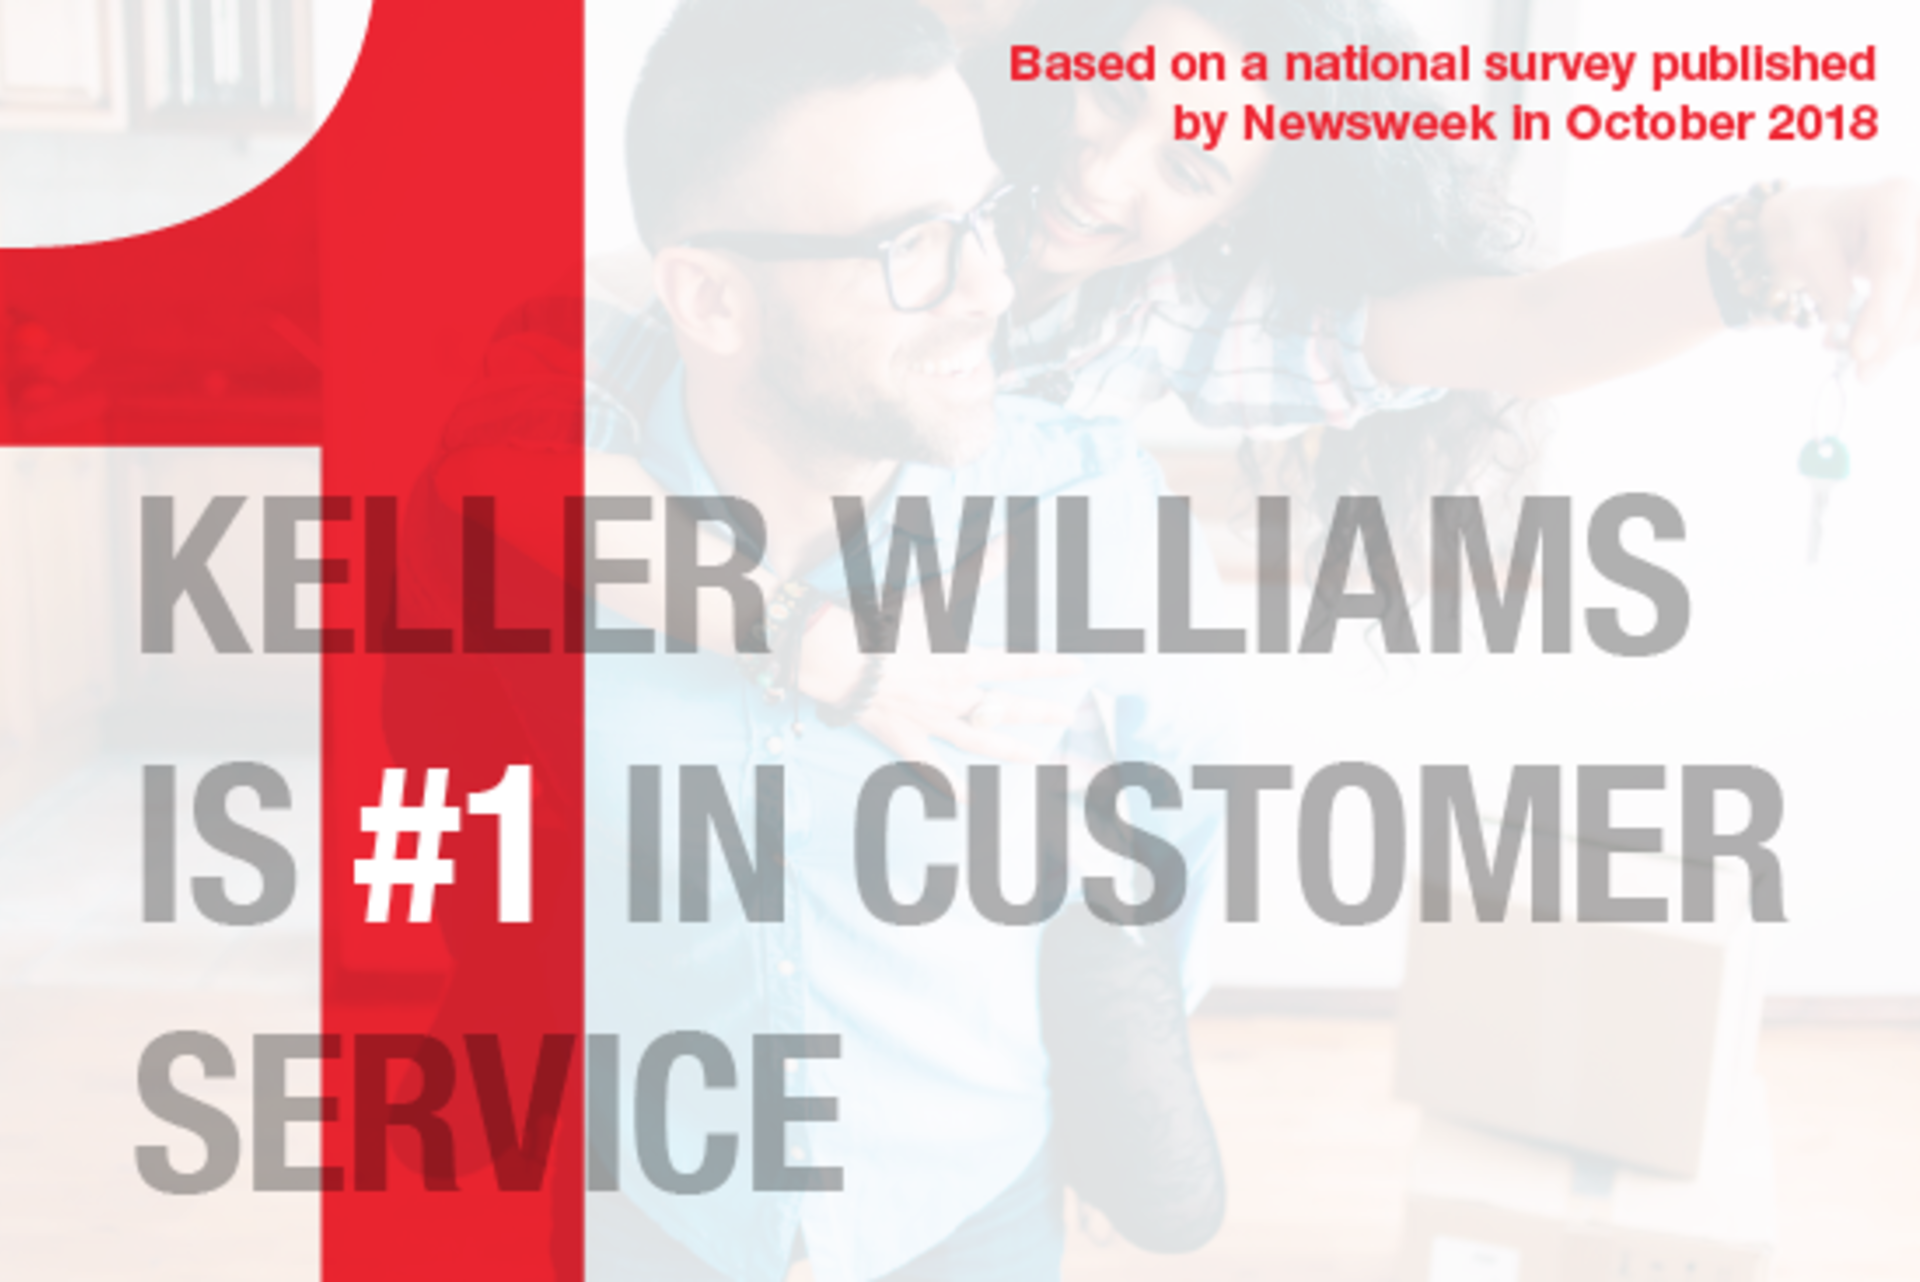 Keller Williams #1 in Customer Satisfaction